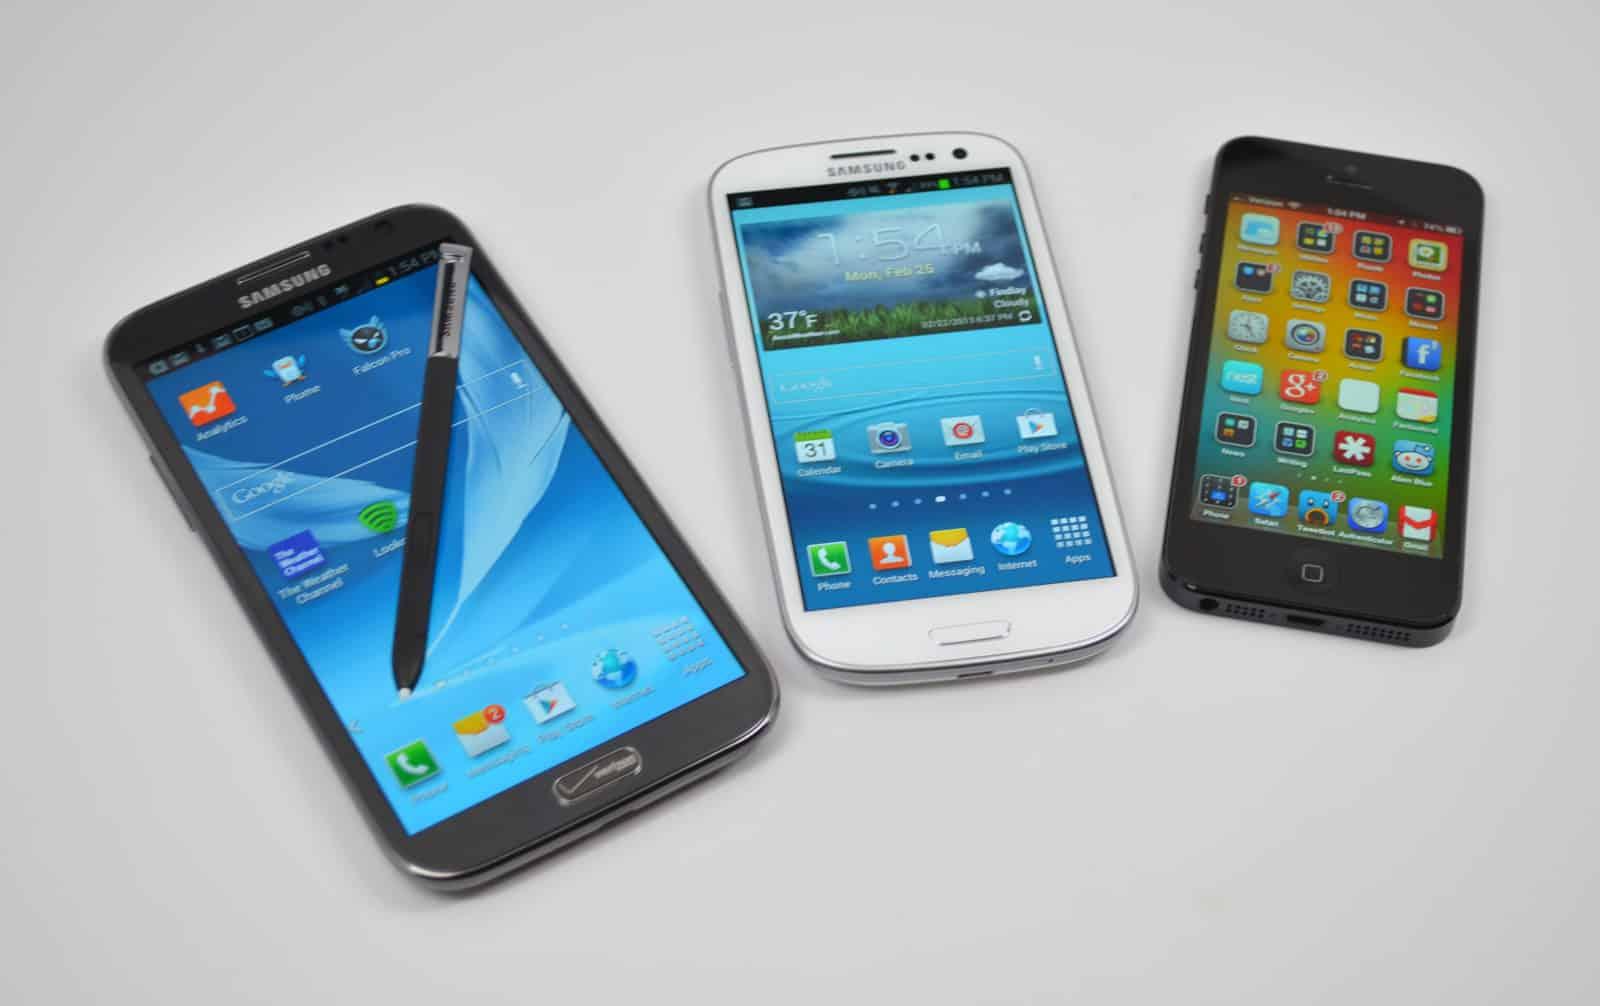 Samsung-Galaxy-Note-2-vs-Galaxy-S3-vs-iPhone-5-6